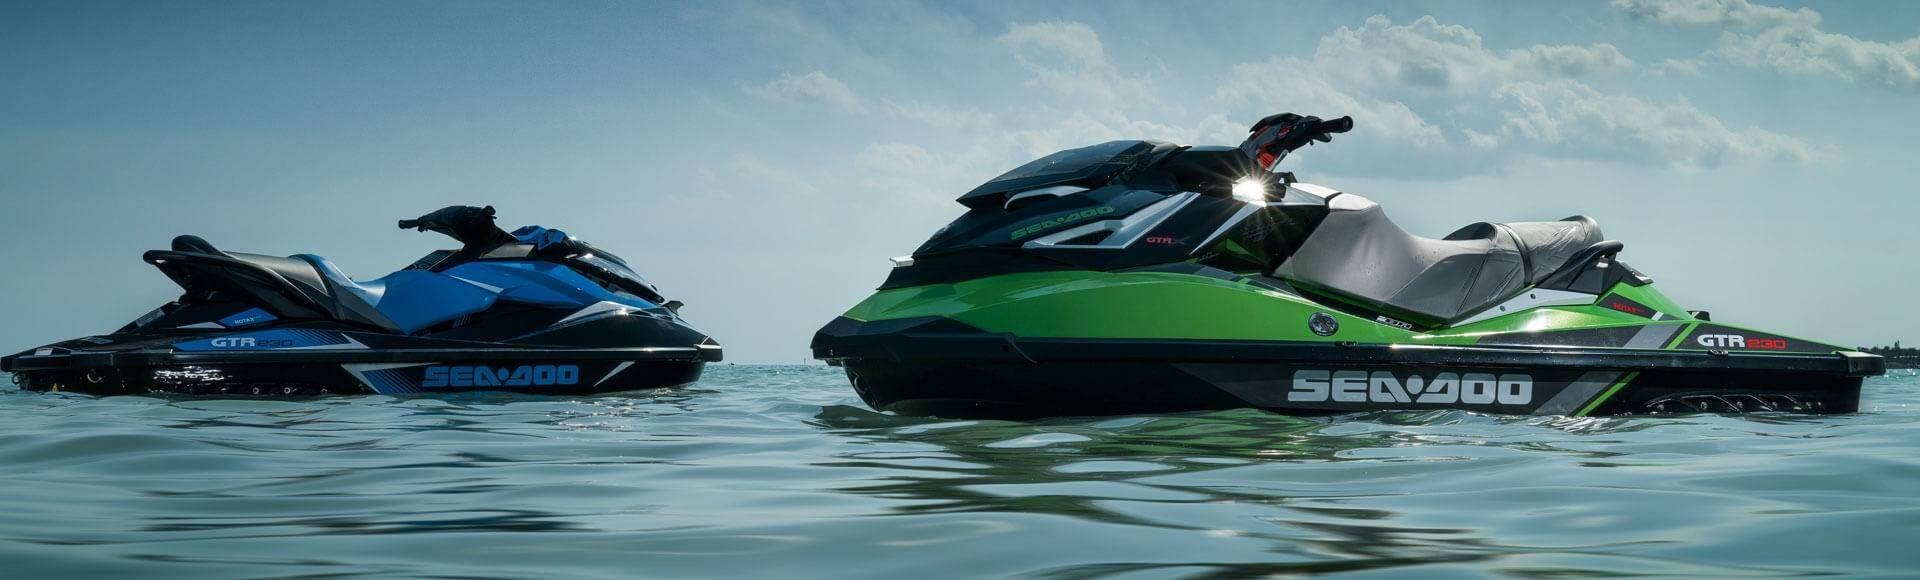 SK Watercraft Rentals | Jet Skis, Segways, Snowmobiles